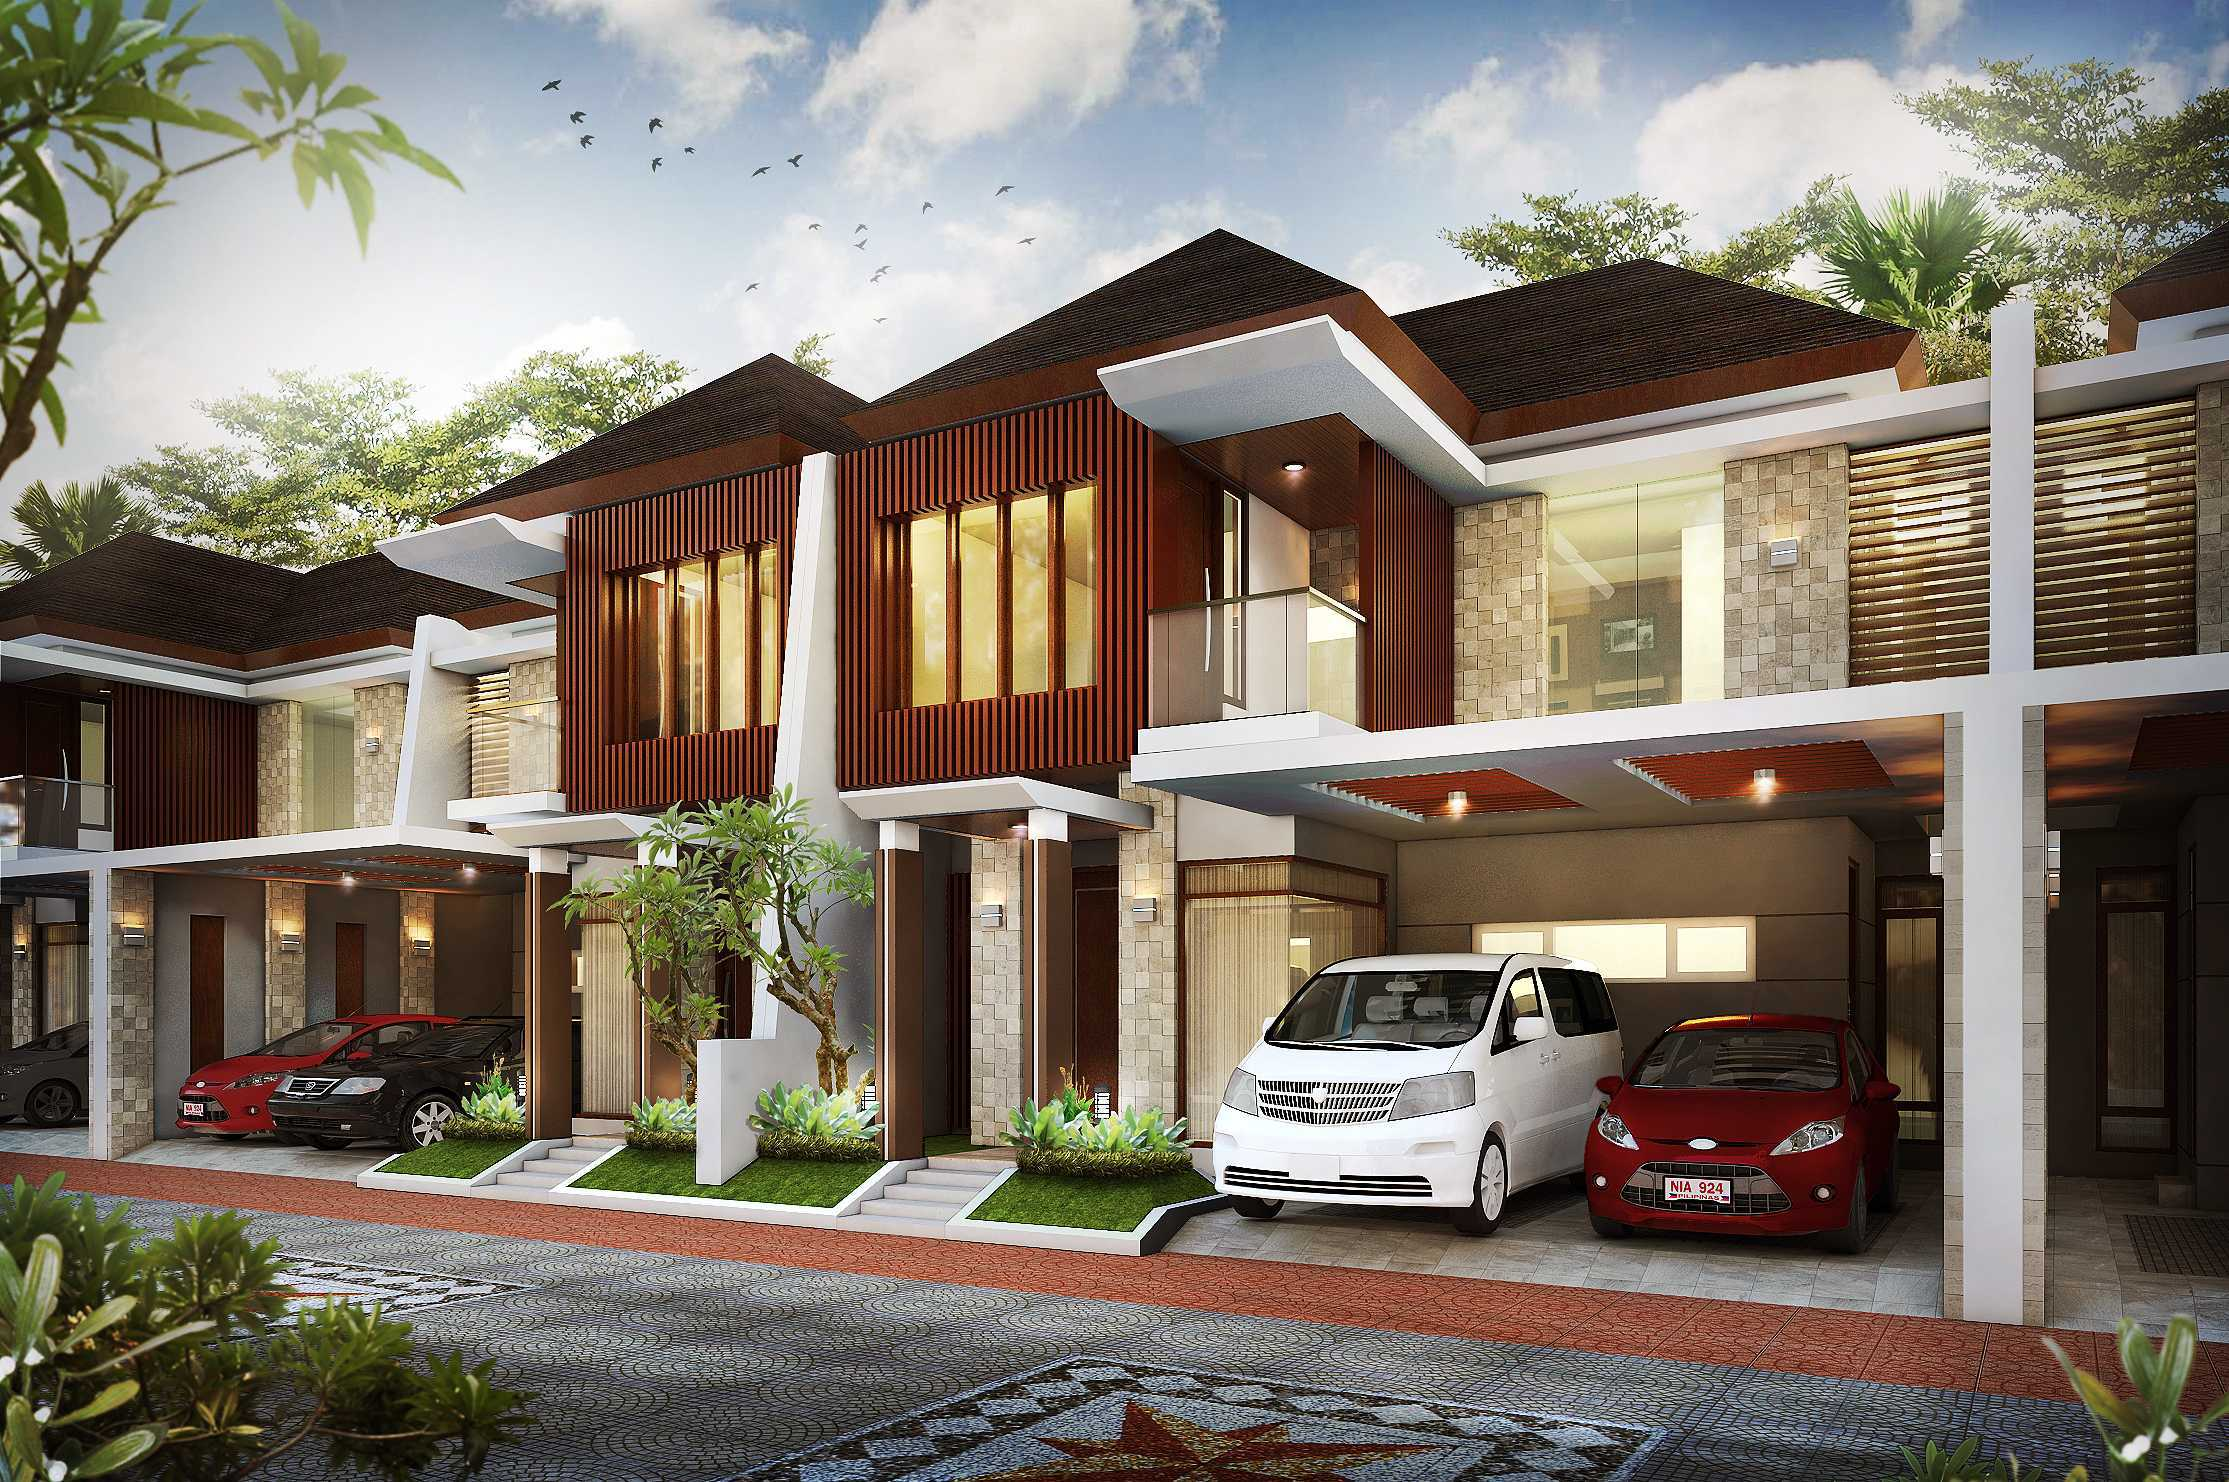 Hendra Budi Architect The Grand Vista Residence Yogyakarta Yogyakarta Front View   16936